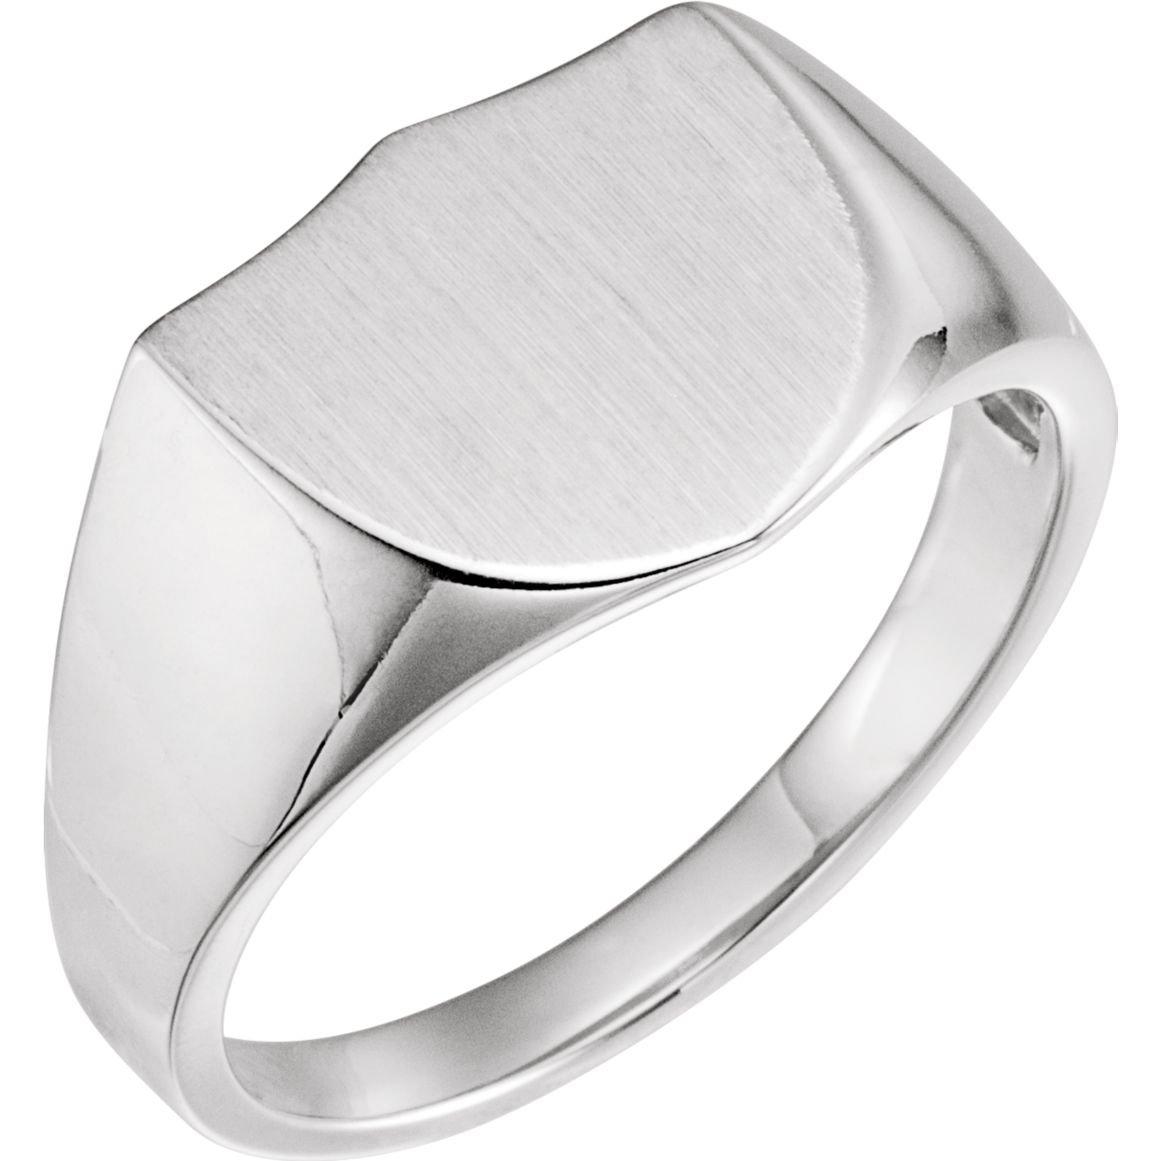 Size 11 Bonyak Jewelry Sterling Silver 14 mm Shield Signet Ring